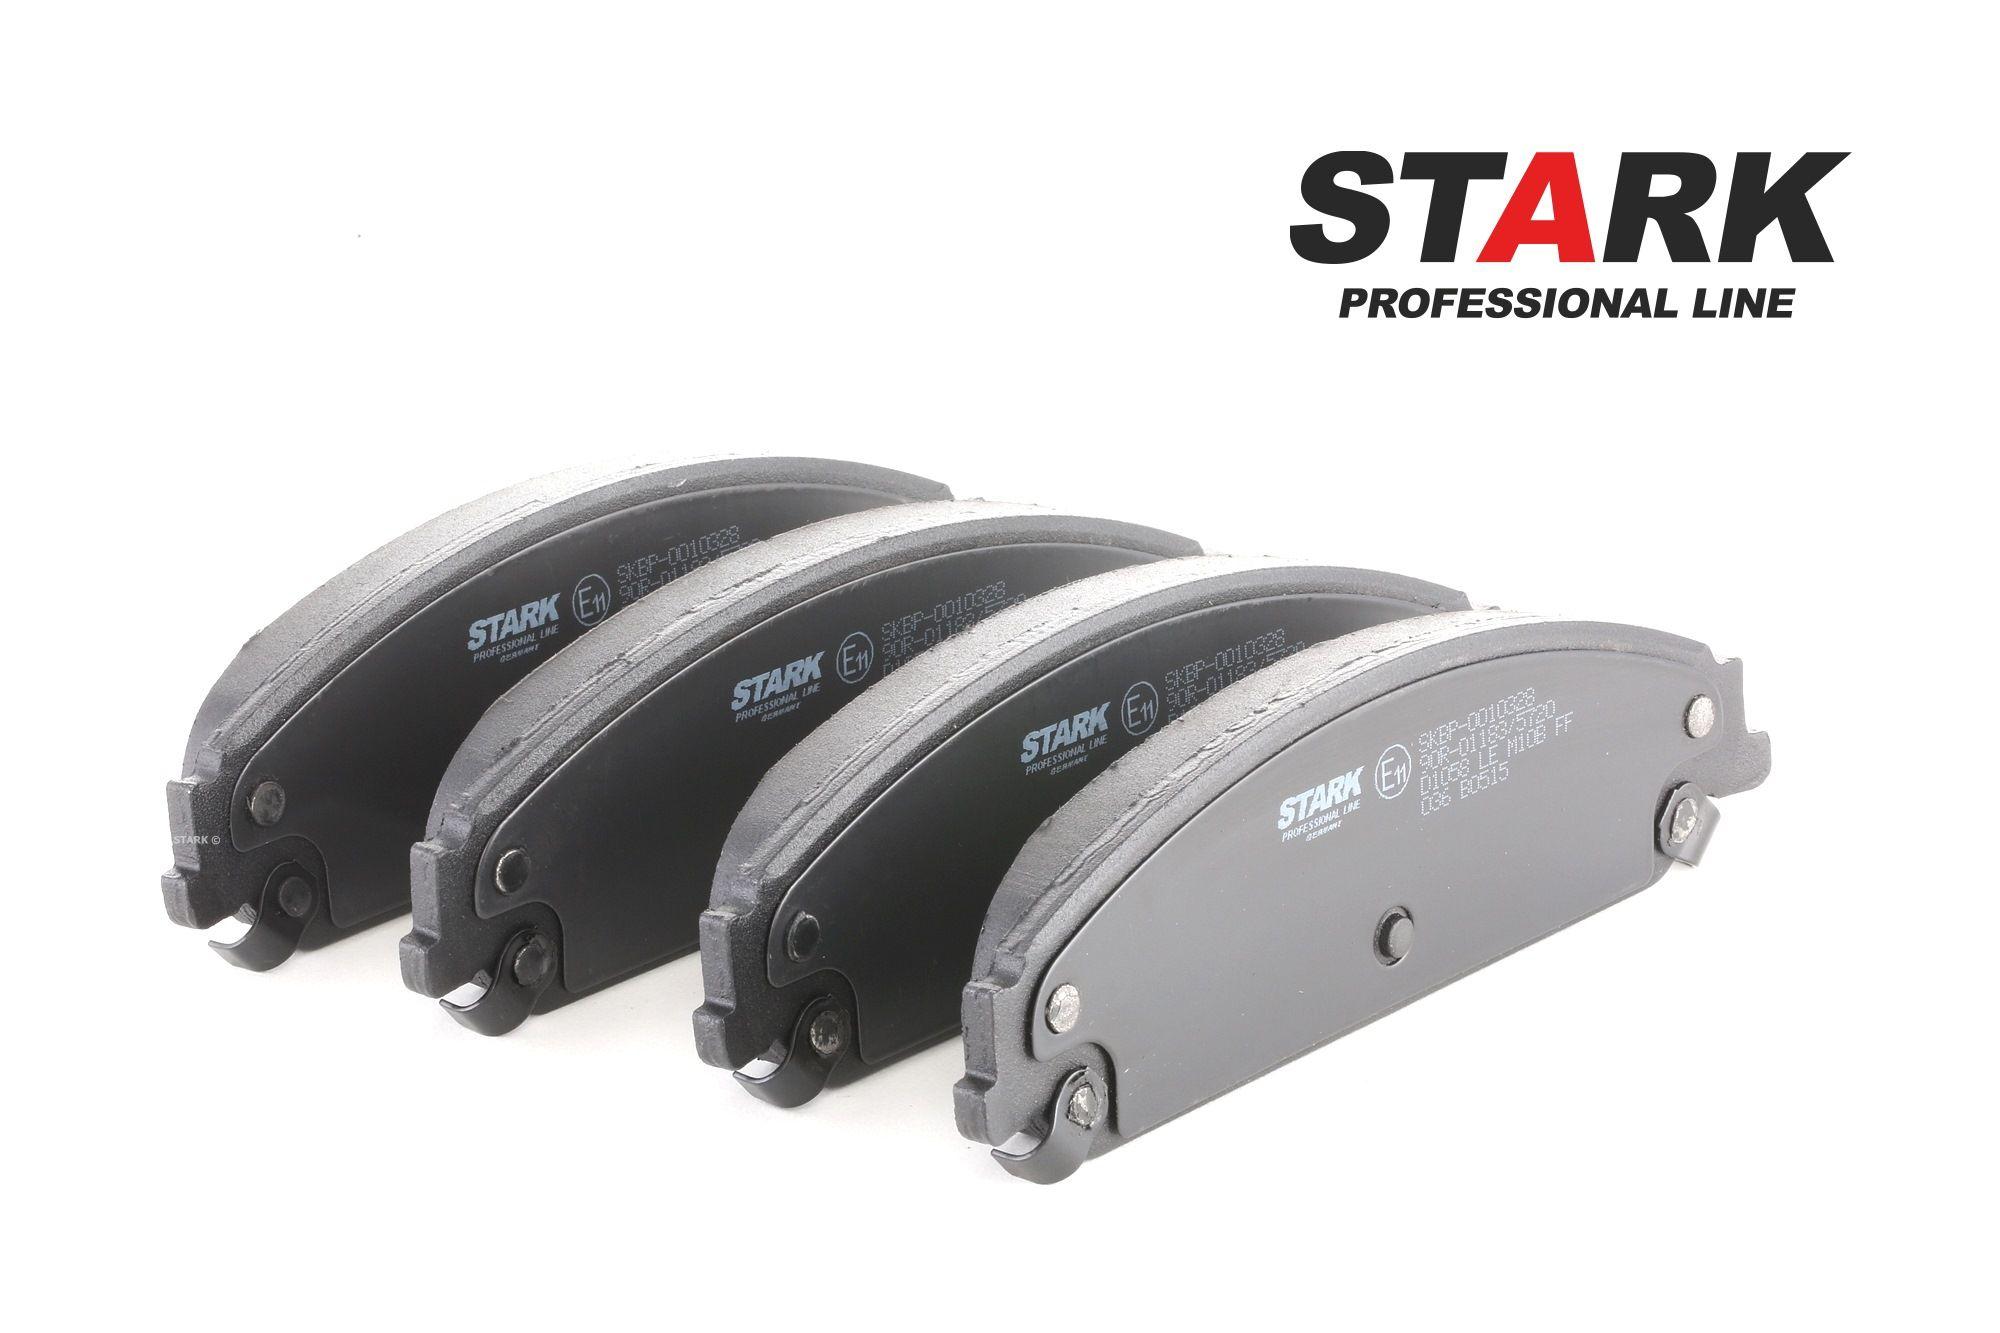 CHRYSLER 300 2017 Bremsbelagsatz Scheibenbremse - Original STARK SKBP-0010328 Höhe: 54,9mm, Breite: 183,4mm, Dicke/Stärke: 18,1mm